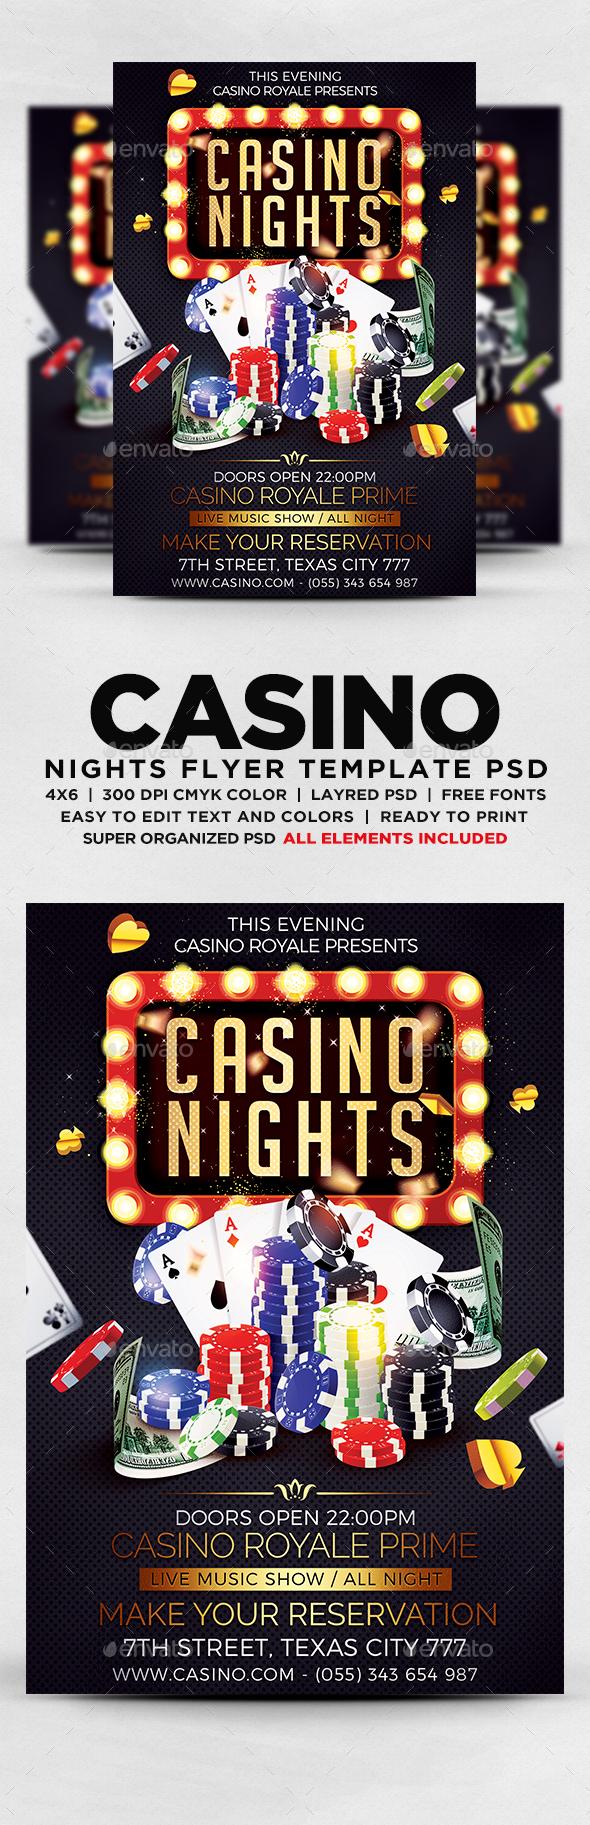 Casino Nights Flyer